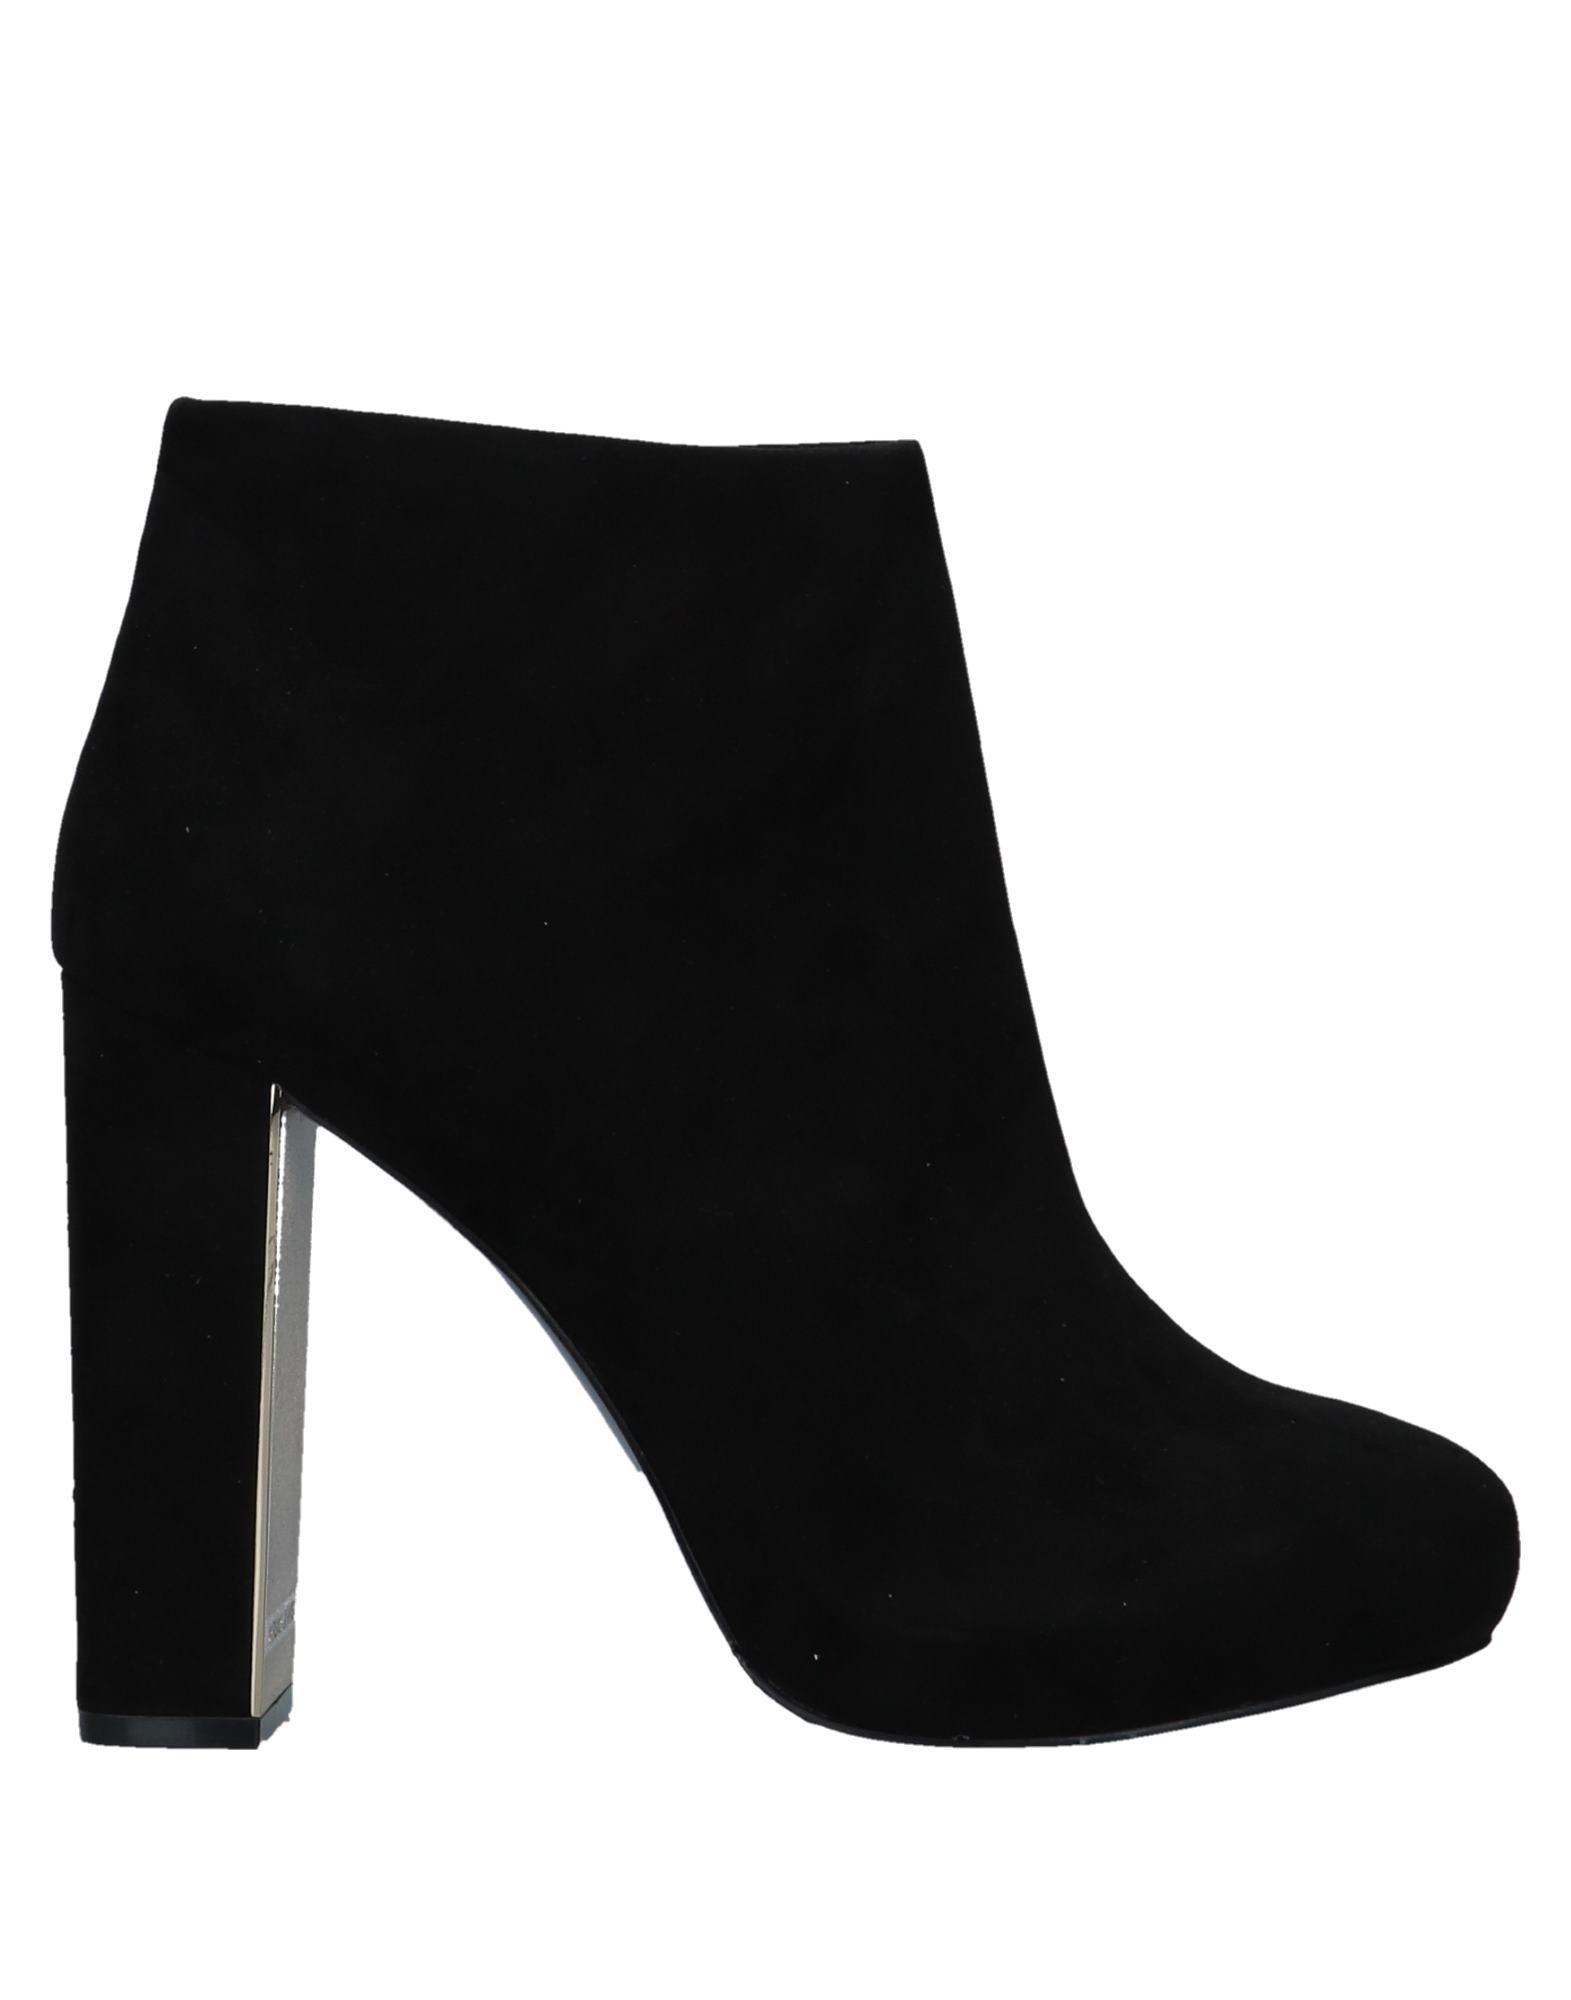 Versace Jeans Stiefelette Damen  Schuhe 11521311LO Neue Schuhe  043283